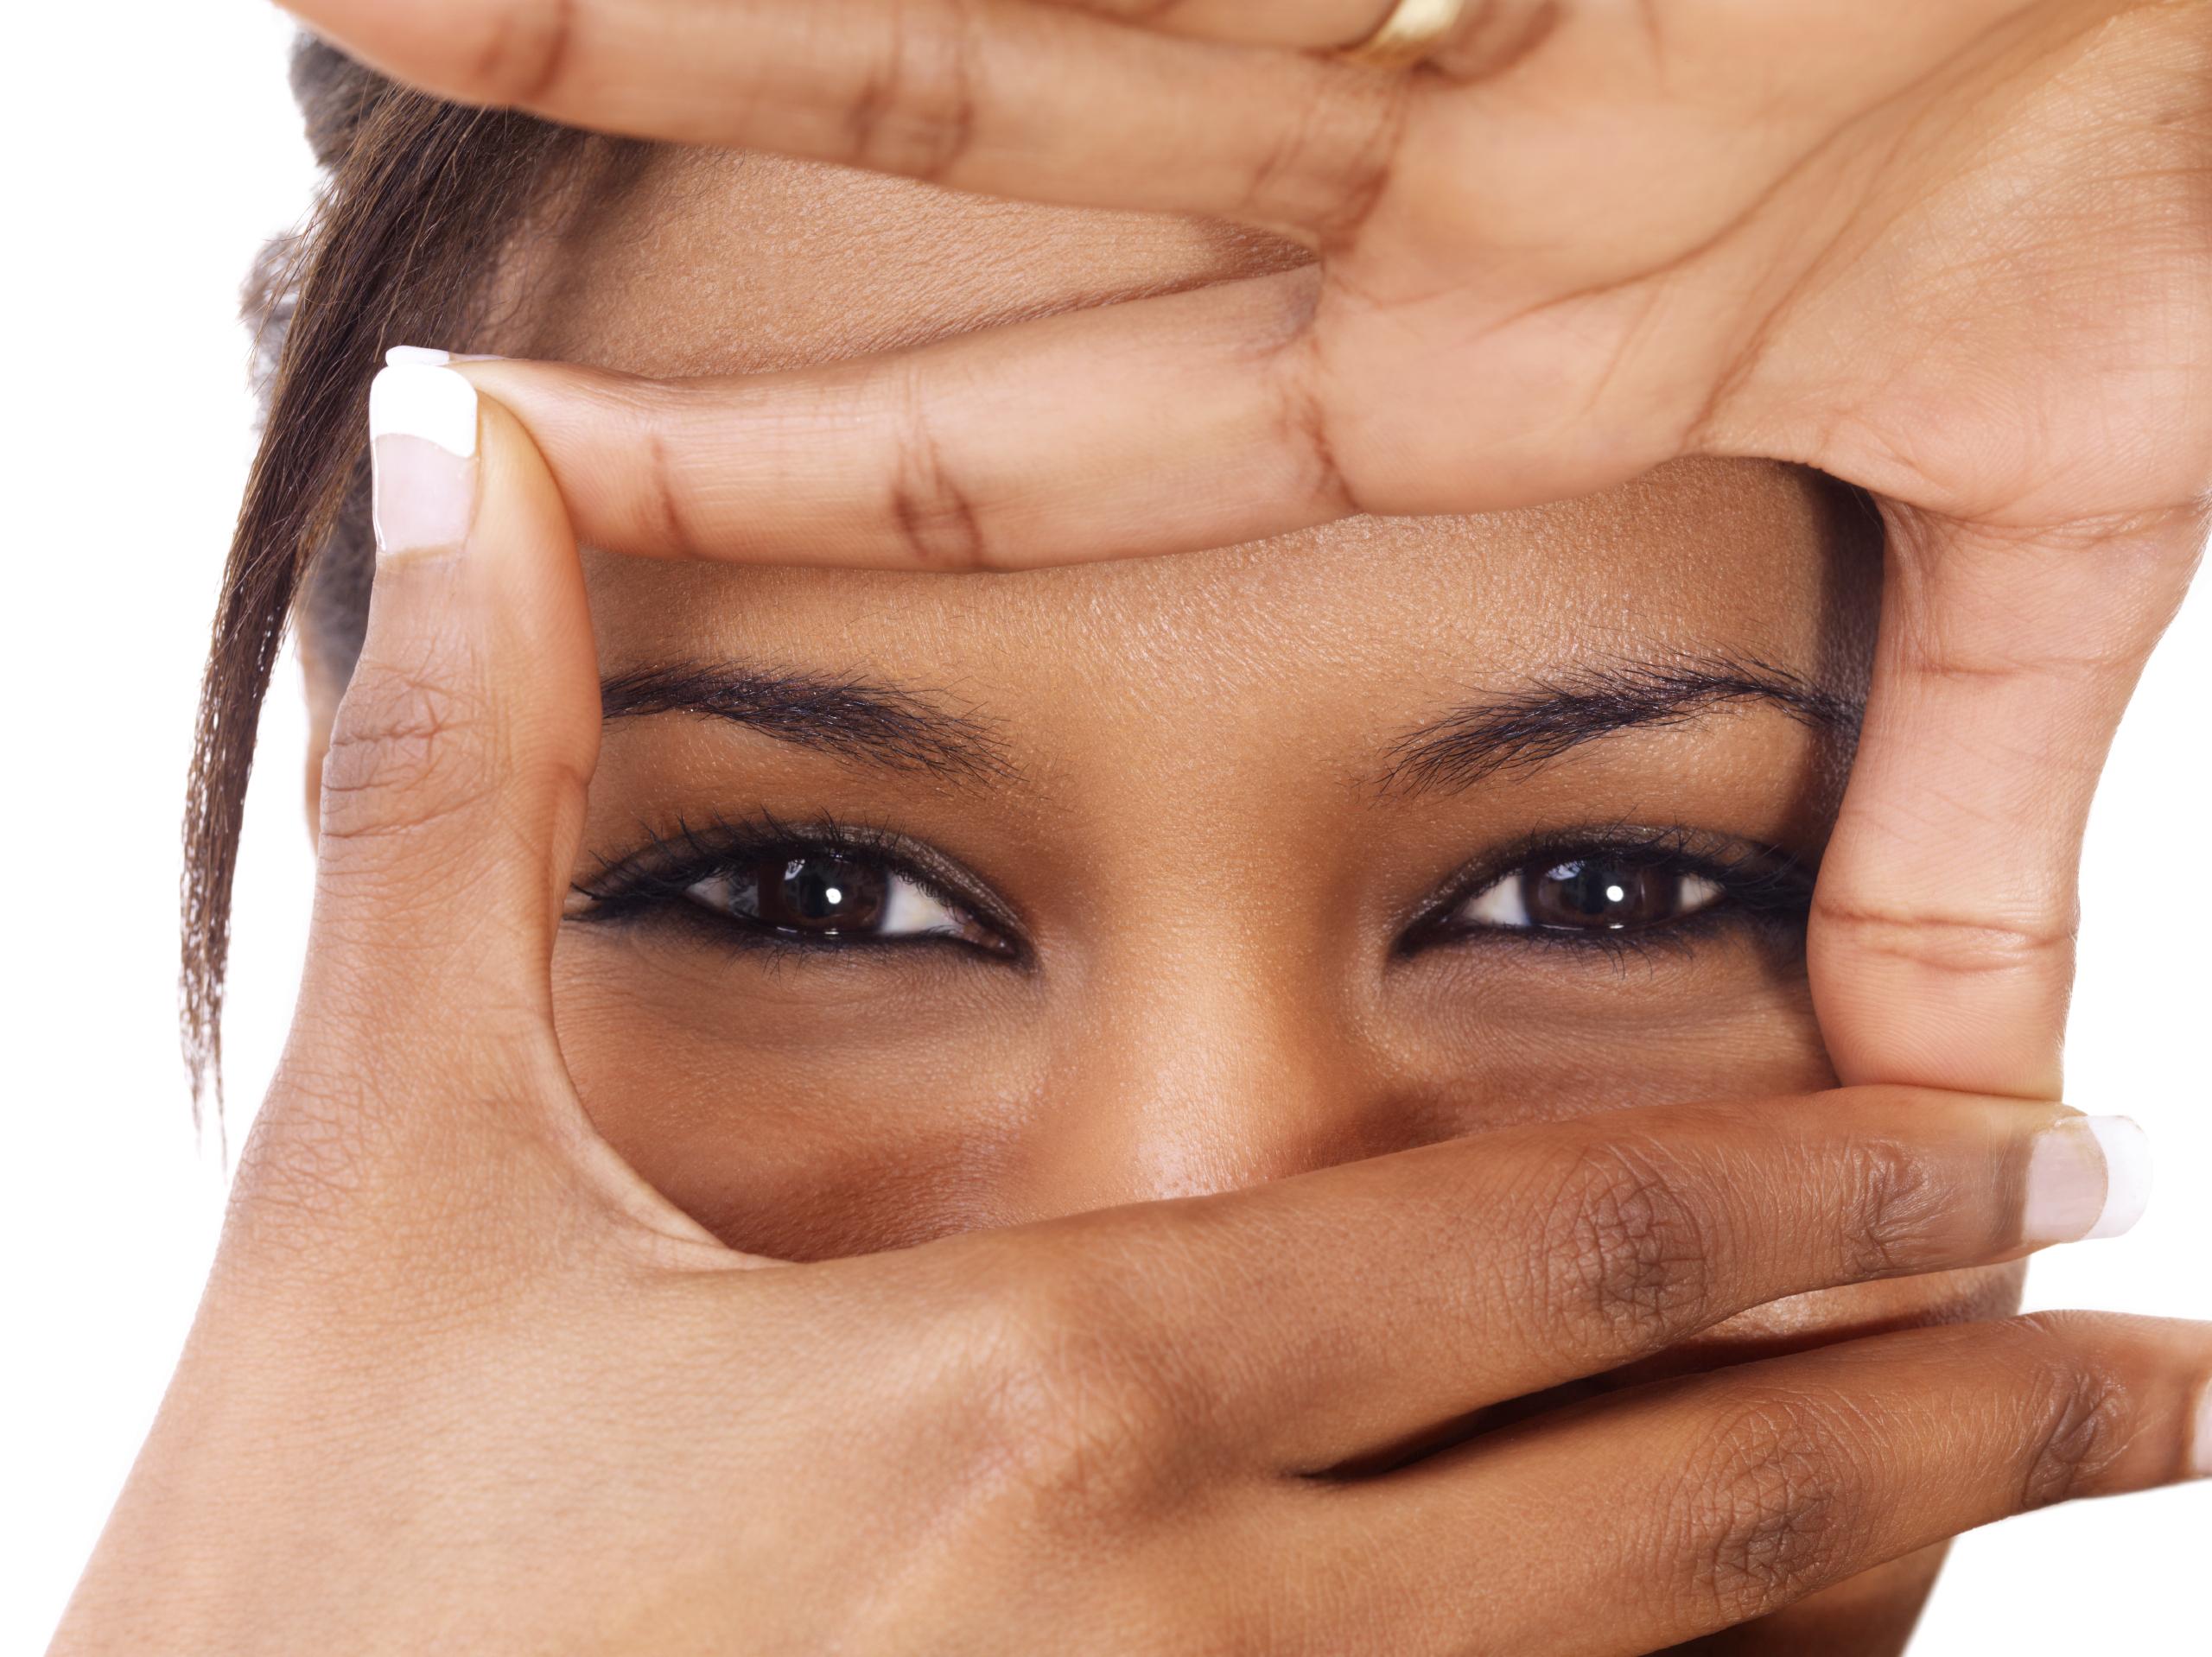 istock-6453018-eyes-face-hands-e98b9b2c9c5cc71312f801b13851062406fe08ba